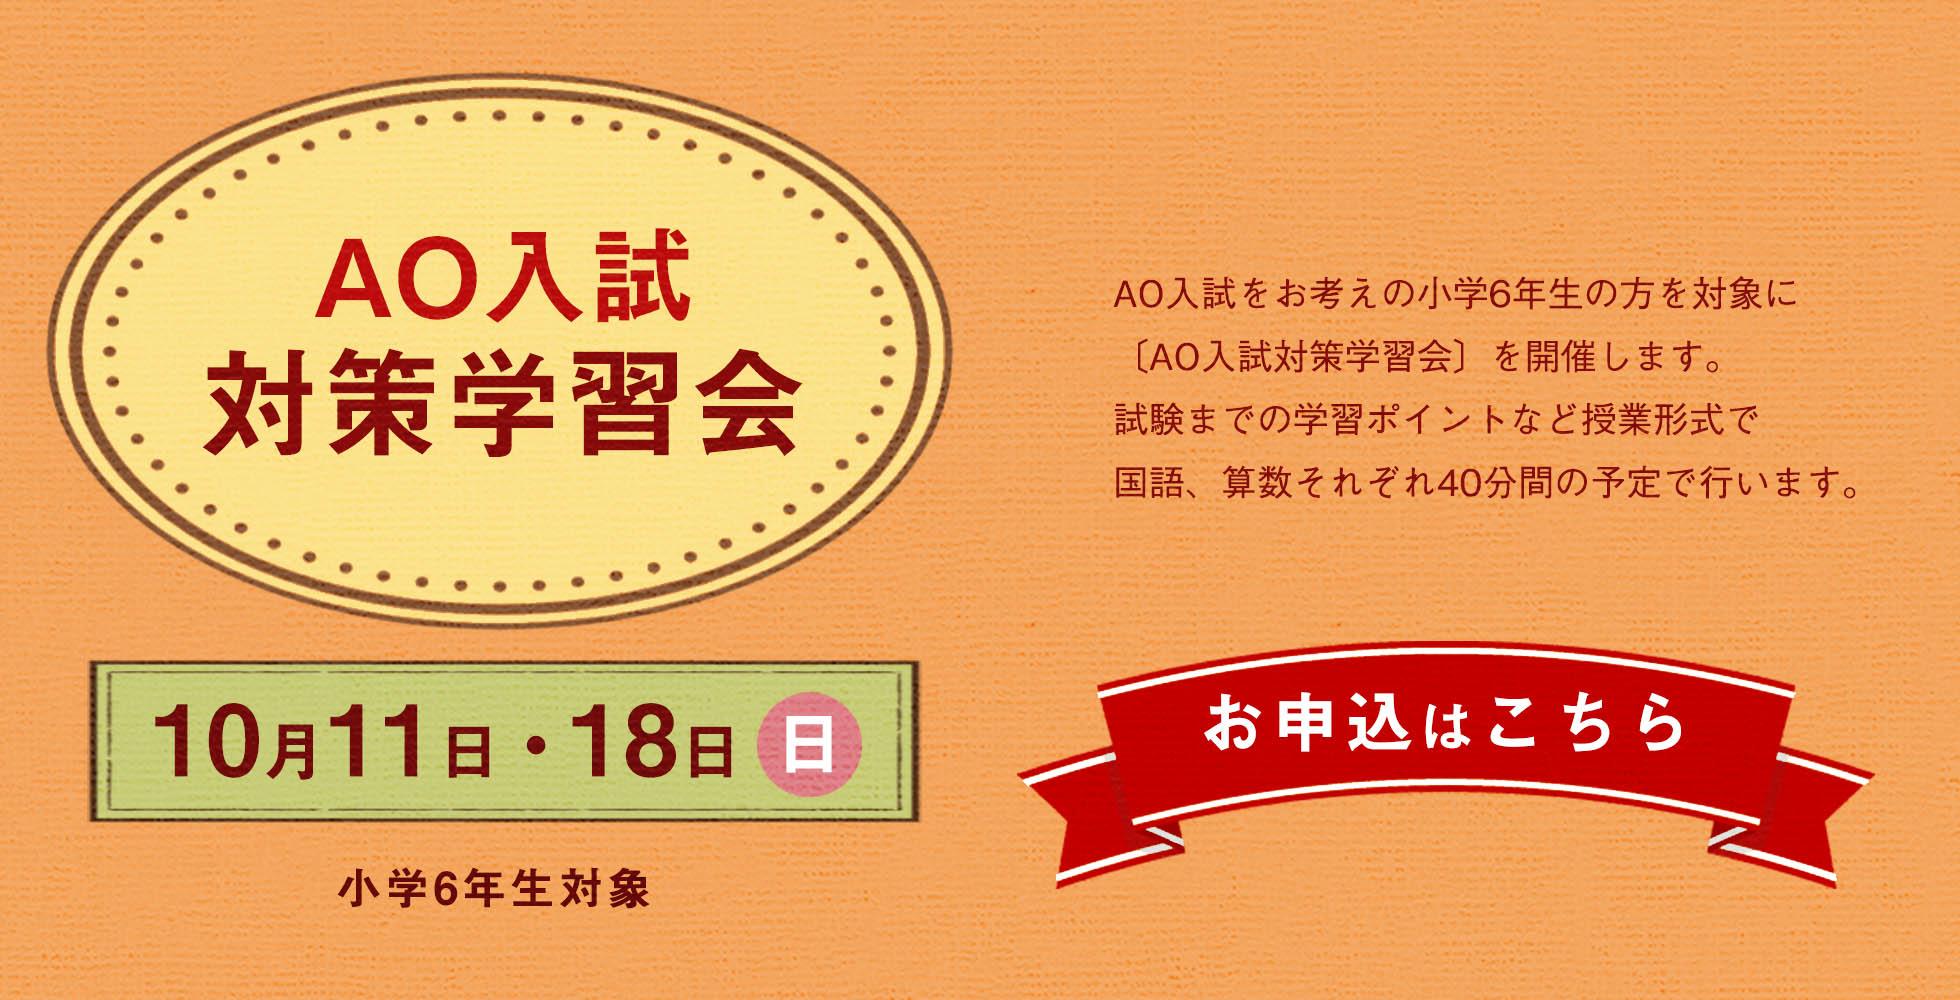 AO入試対策学習会